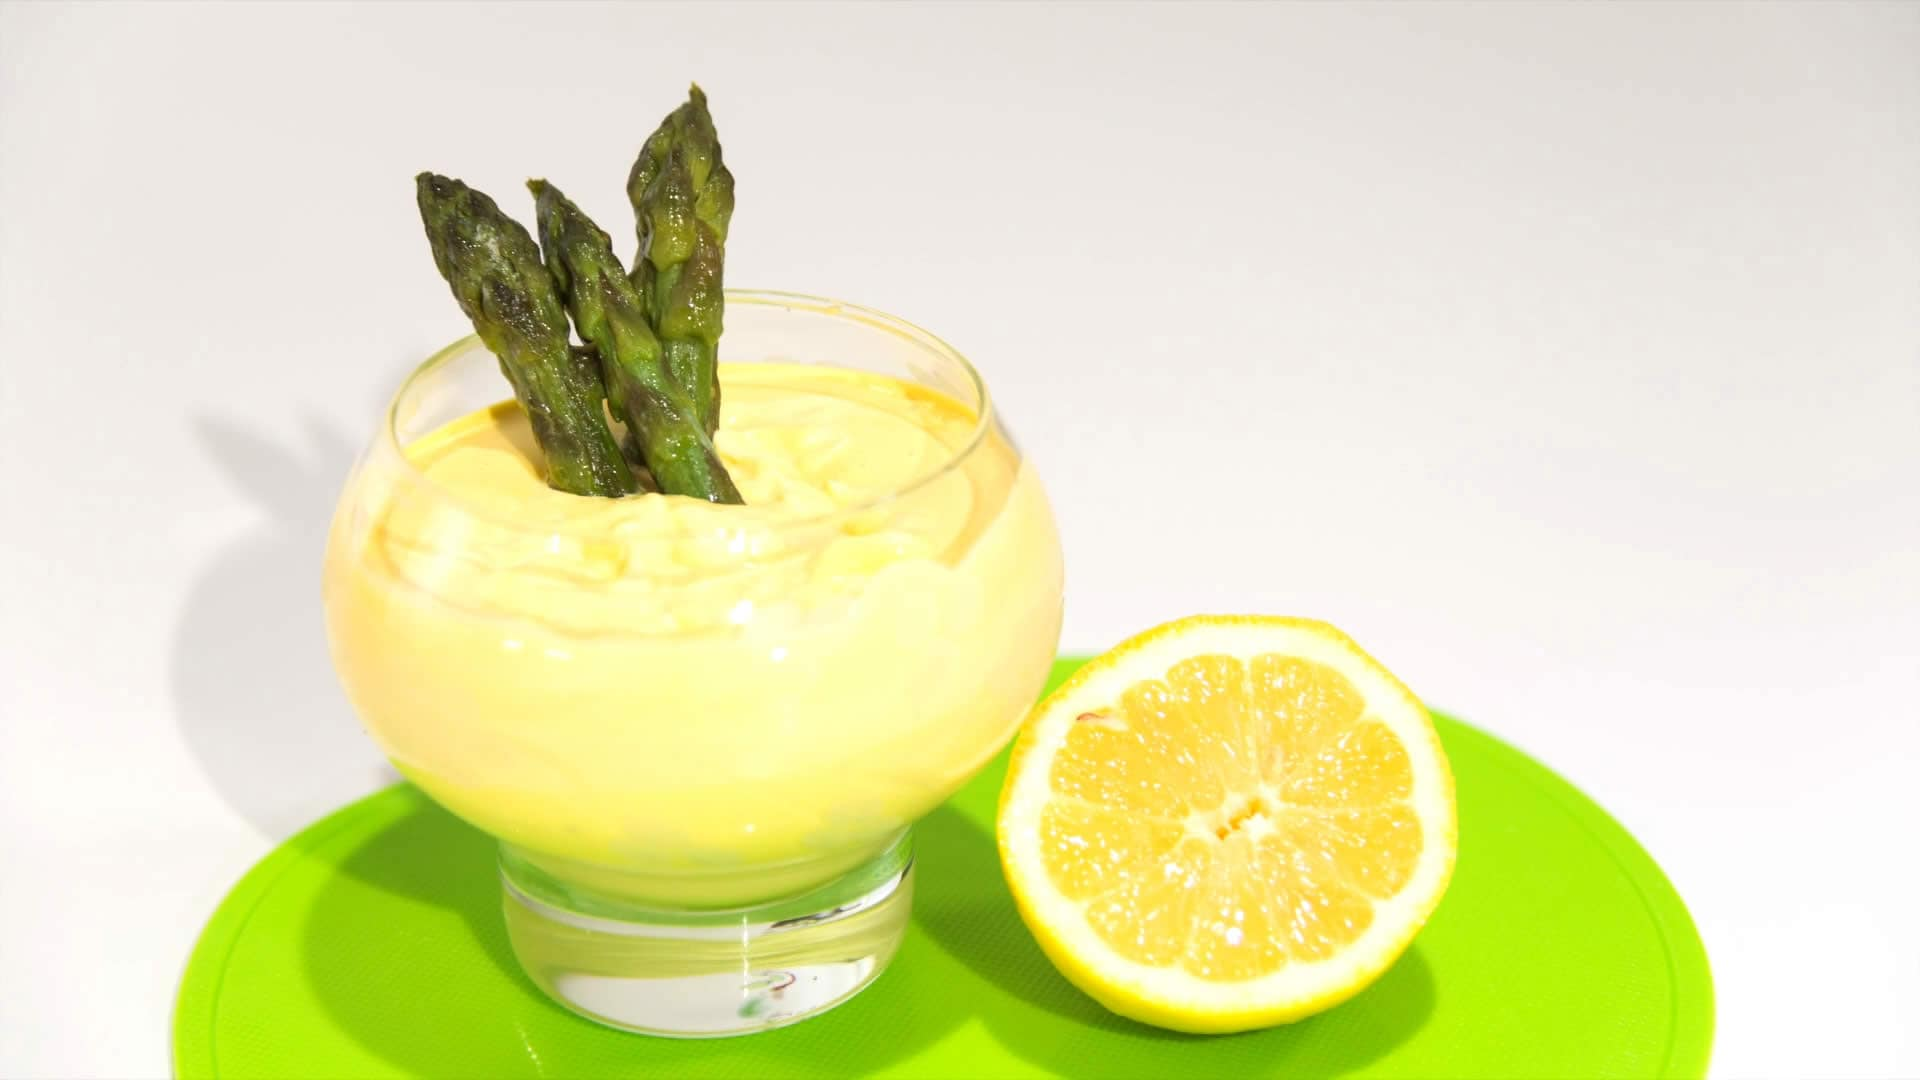 Foto Maionese leggera e maionese allo yogurt